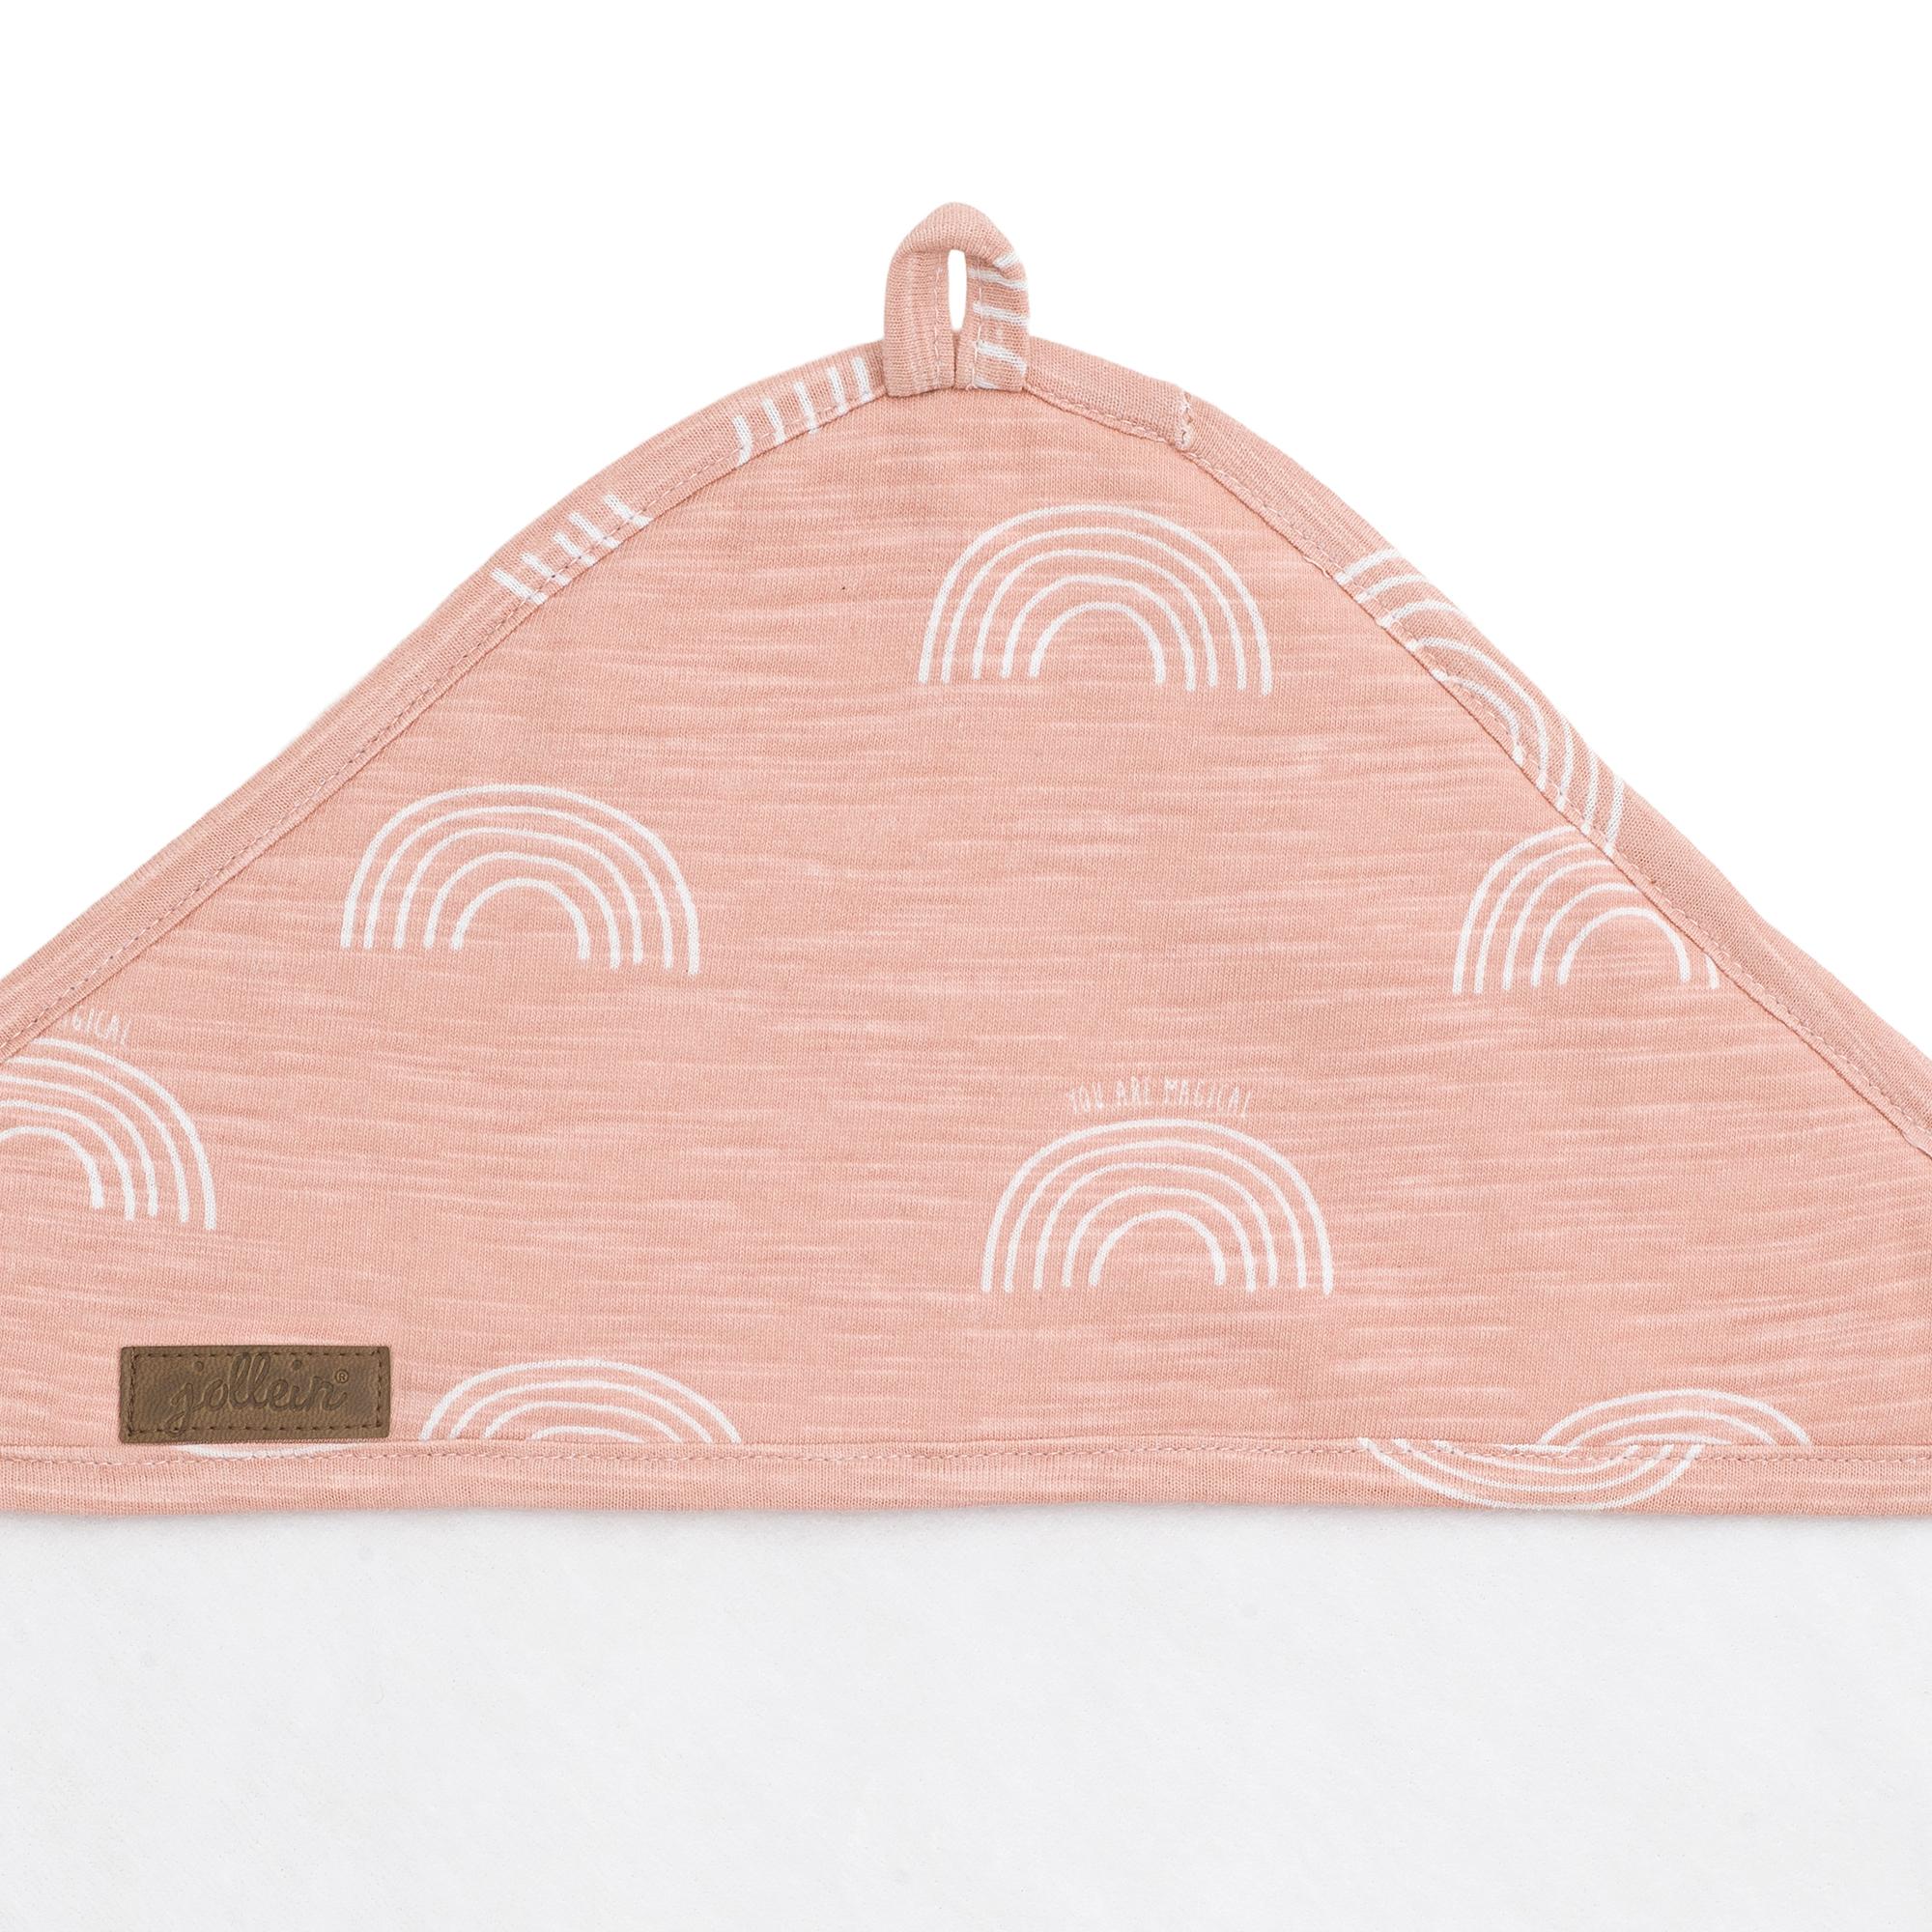 Afbeelding Badcape 100x100cm Rainbow blush pink